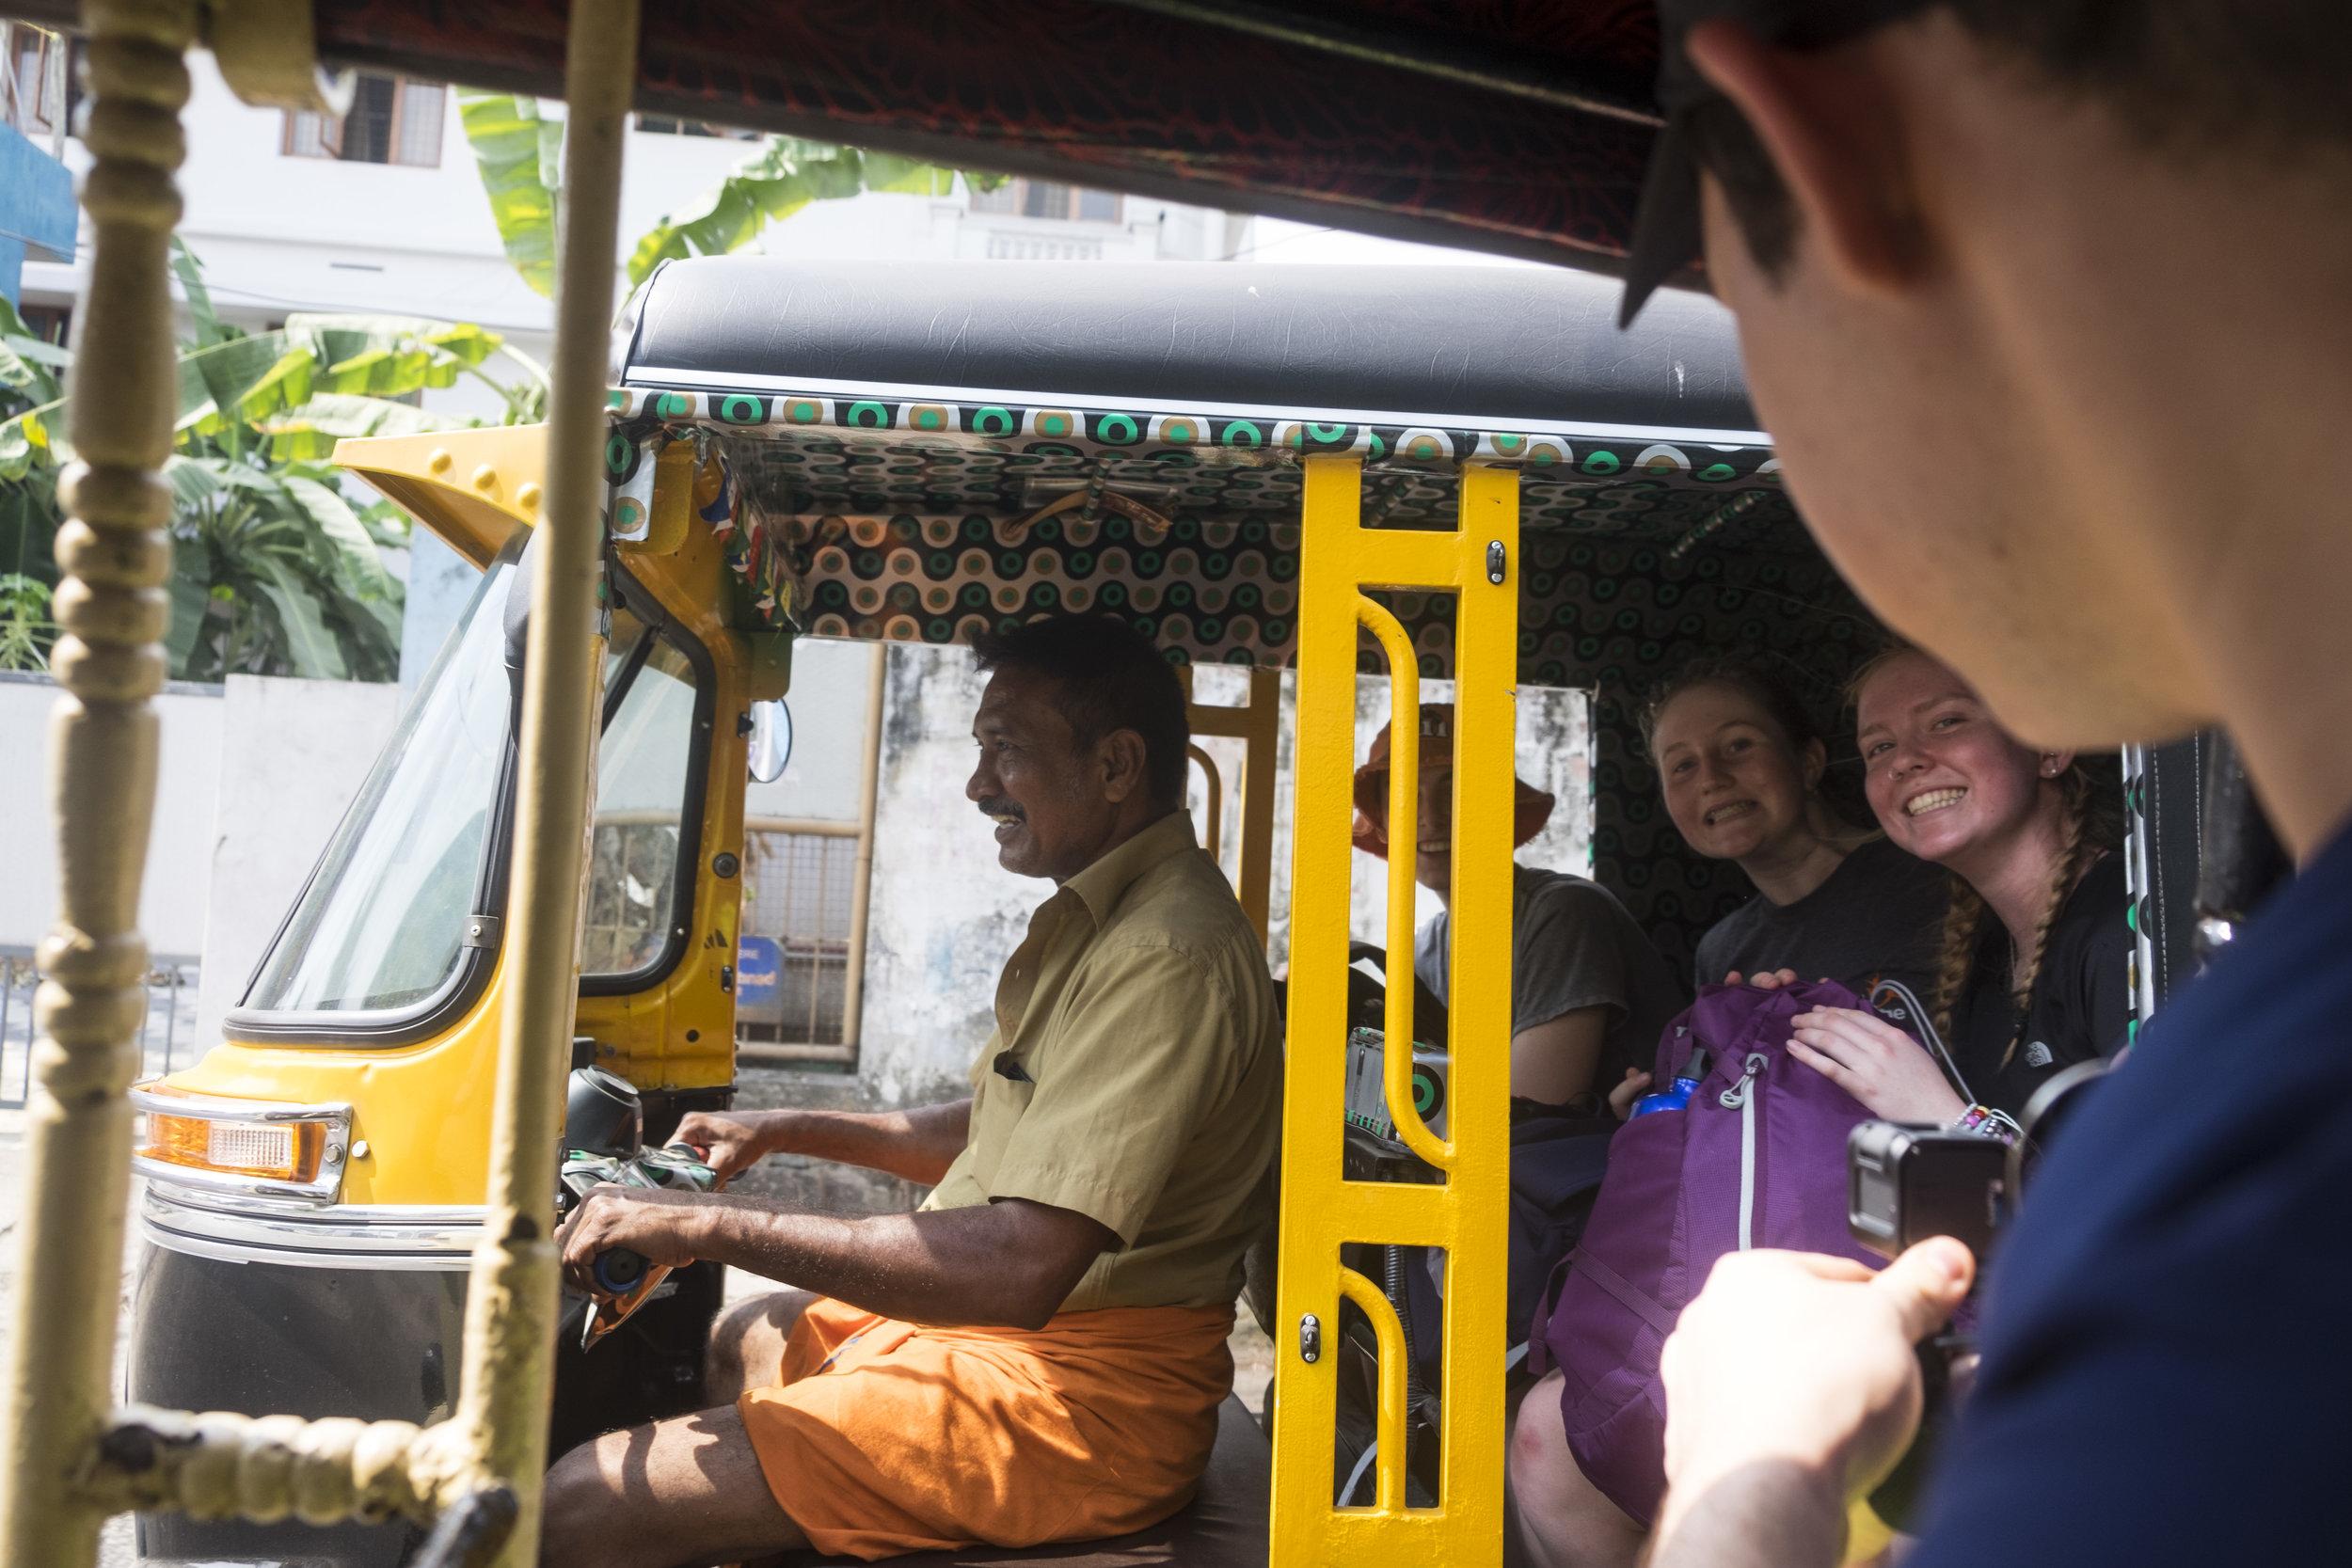 Organising transport for the team in India, Kerala